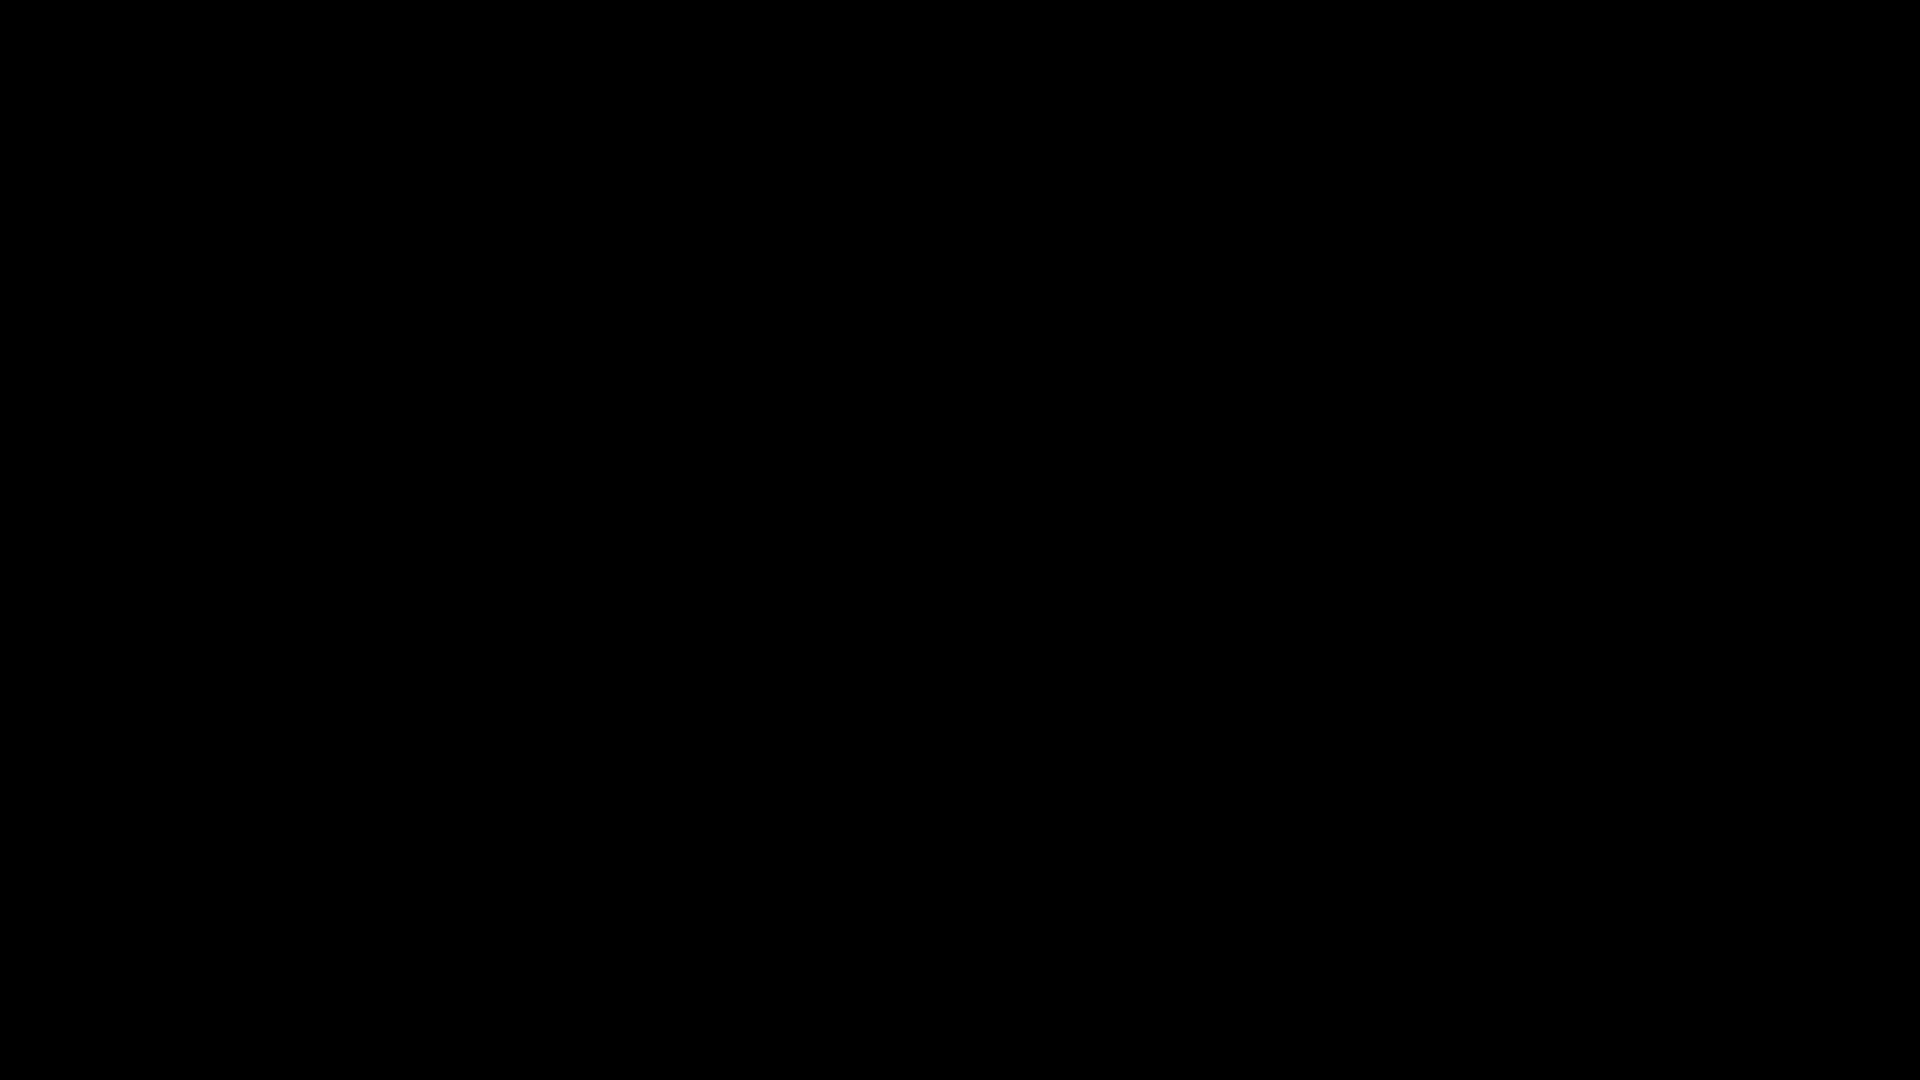 black wallpaper 1080P by noxdark 1920x1080